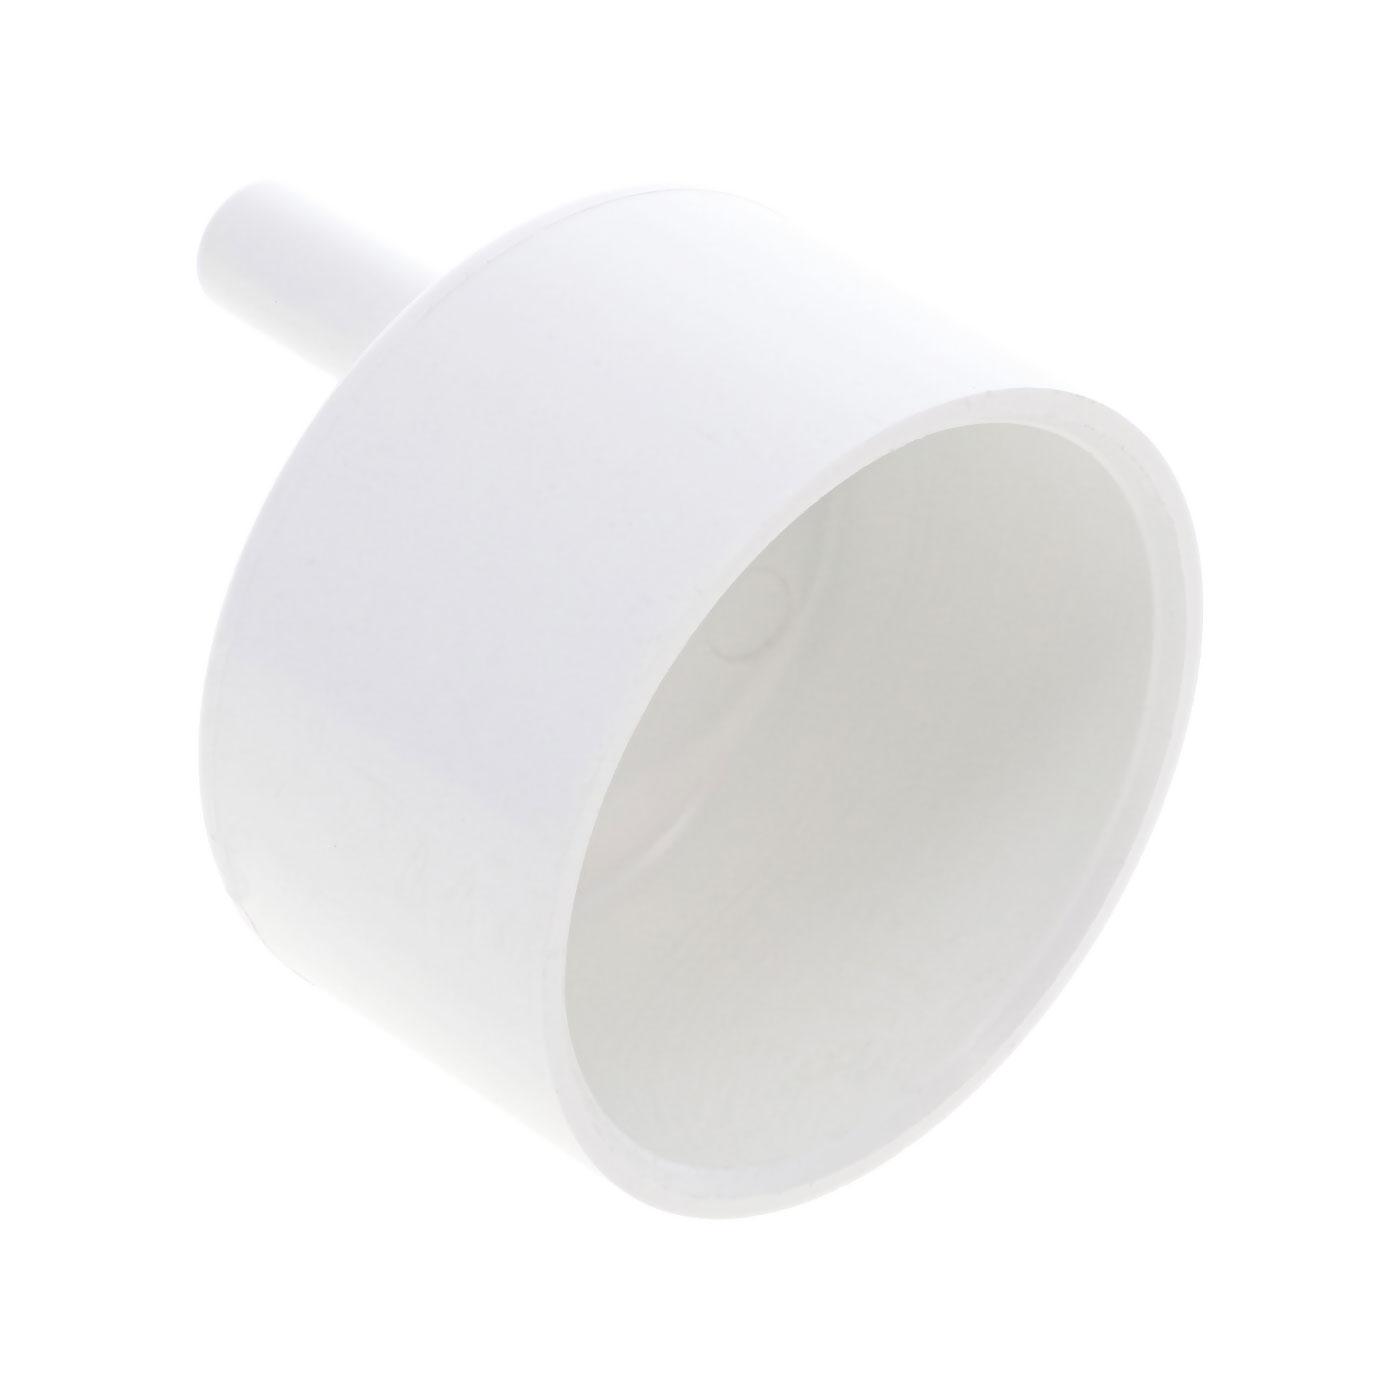 "2"" Manifold or piping plug (60mm)"